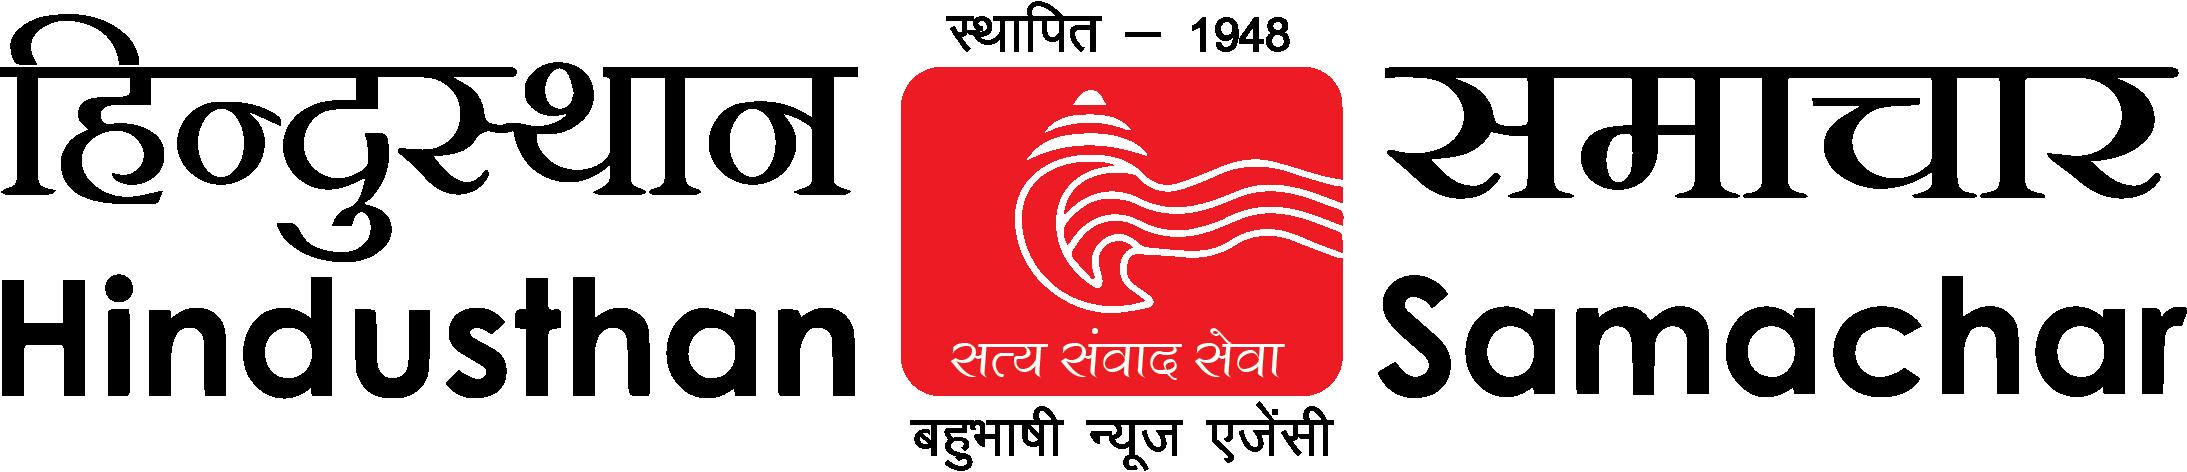 Hindusthan Samachar Urdu